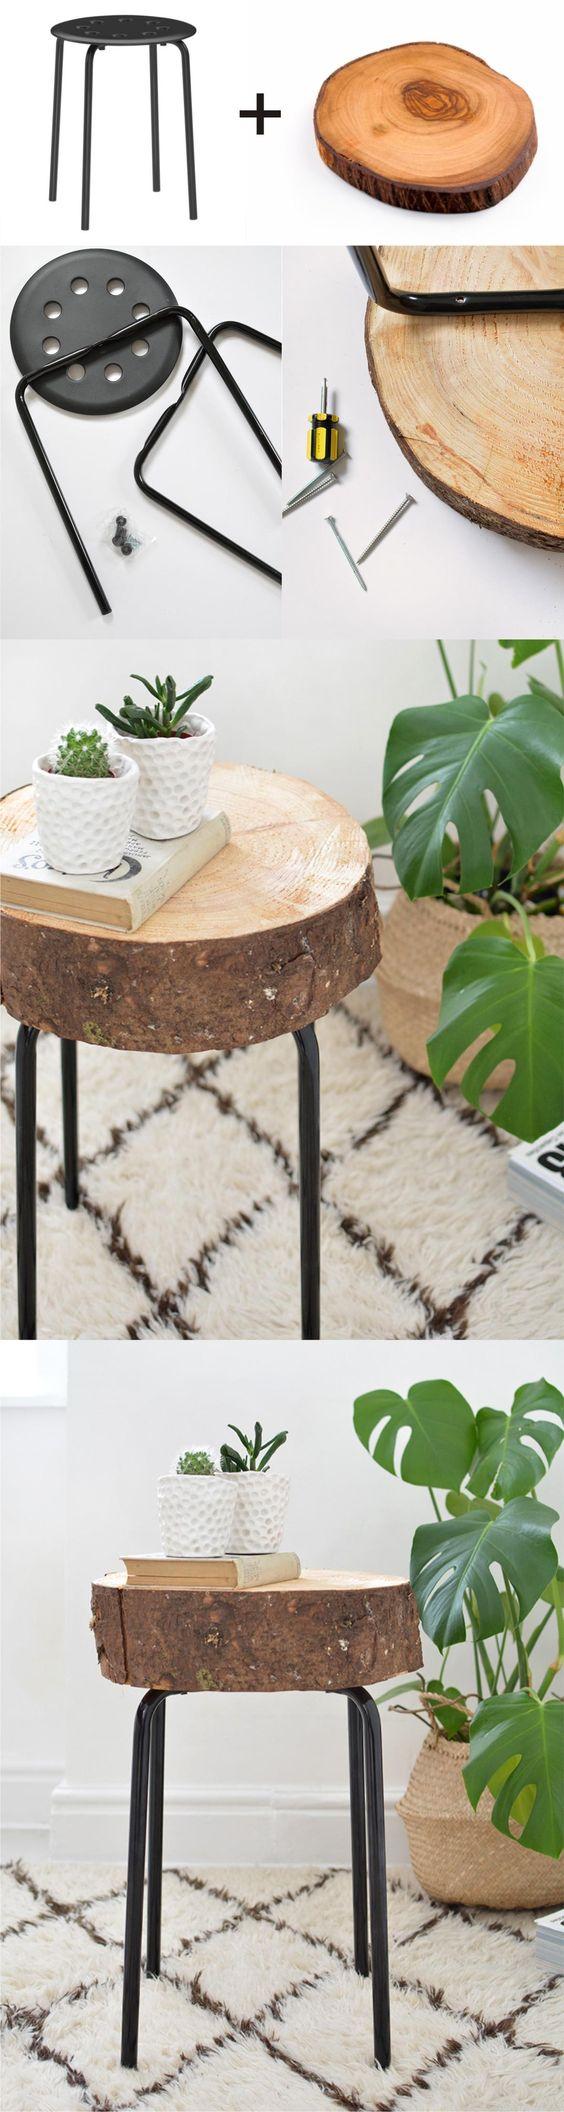 Ikea Hack Wooden Stool